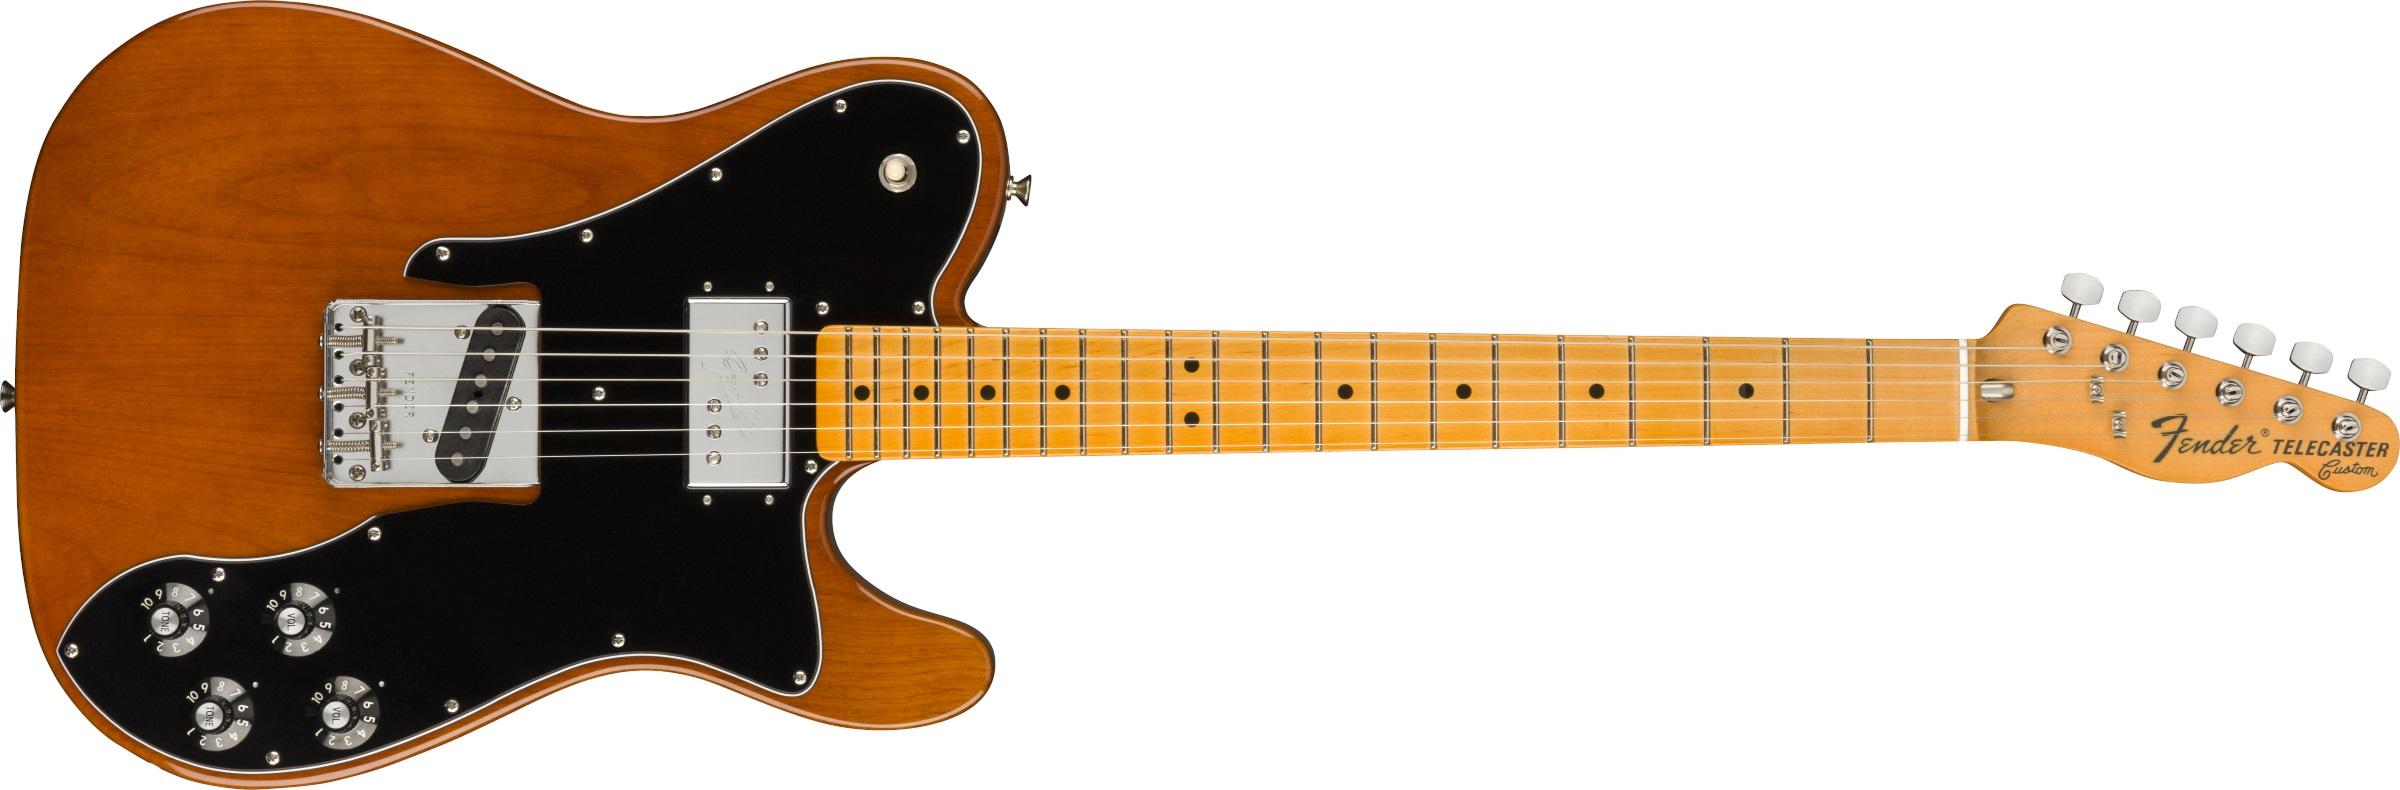 Fender American Original 70s Telecaster MN MO